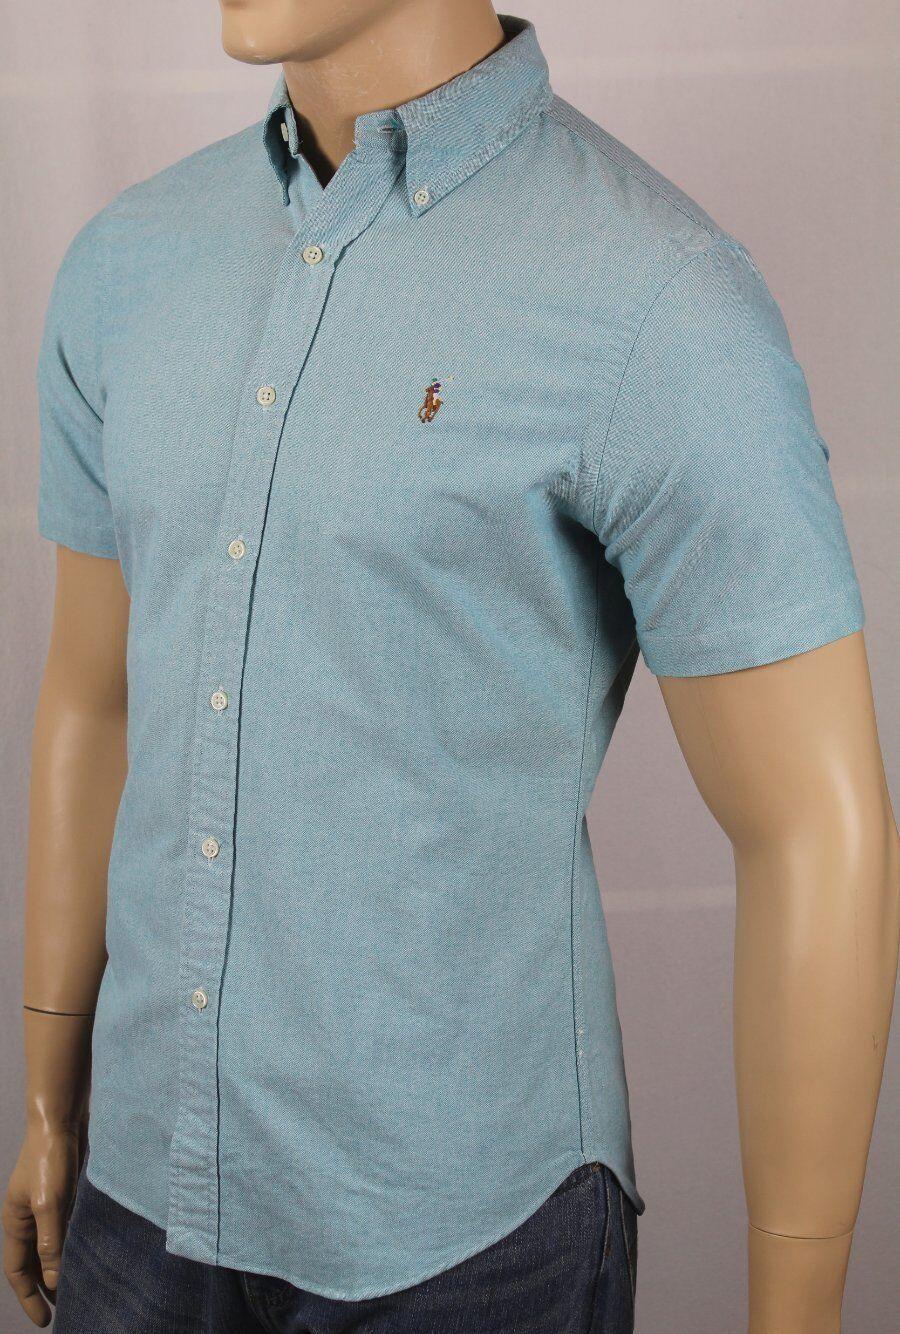 Ralph Lauren bluee Slim Fit Oxford Dress Shirt Multi colord Pony  NWT